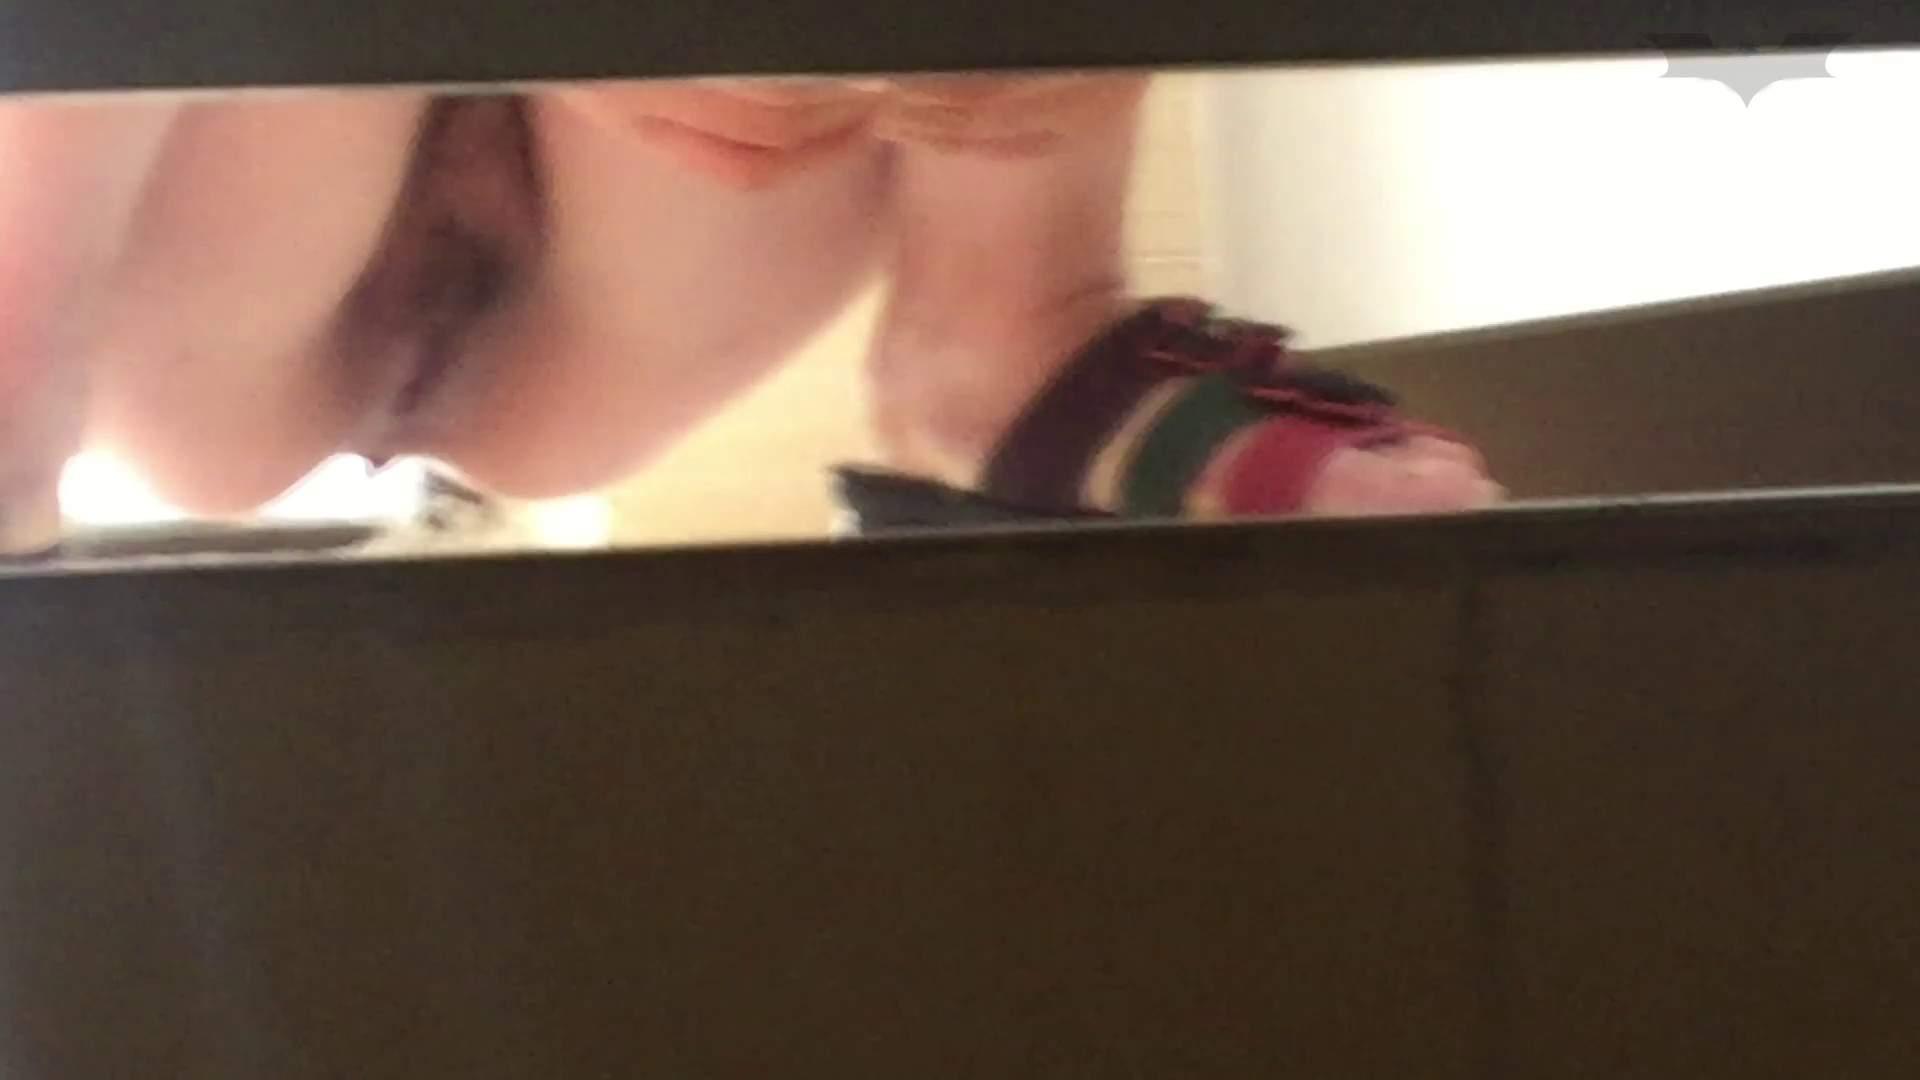 JD盗撮 美女の洗面所の秘密 Vol.74 丸見え セックス画像 109画像 103